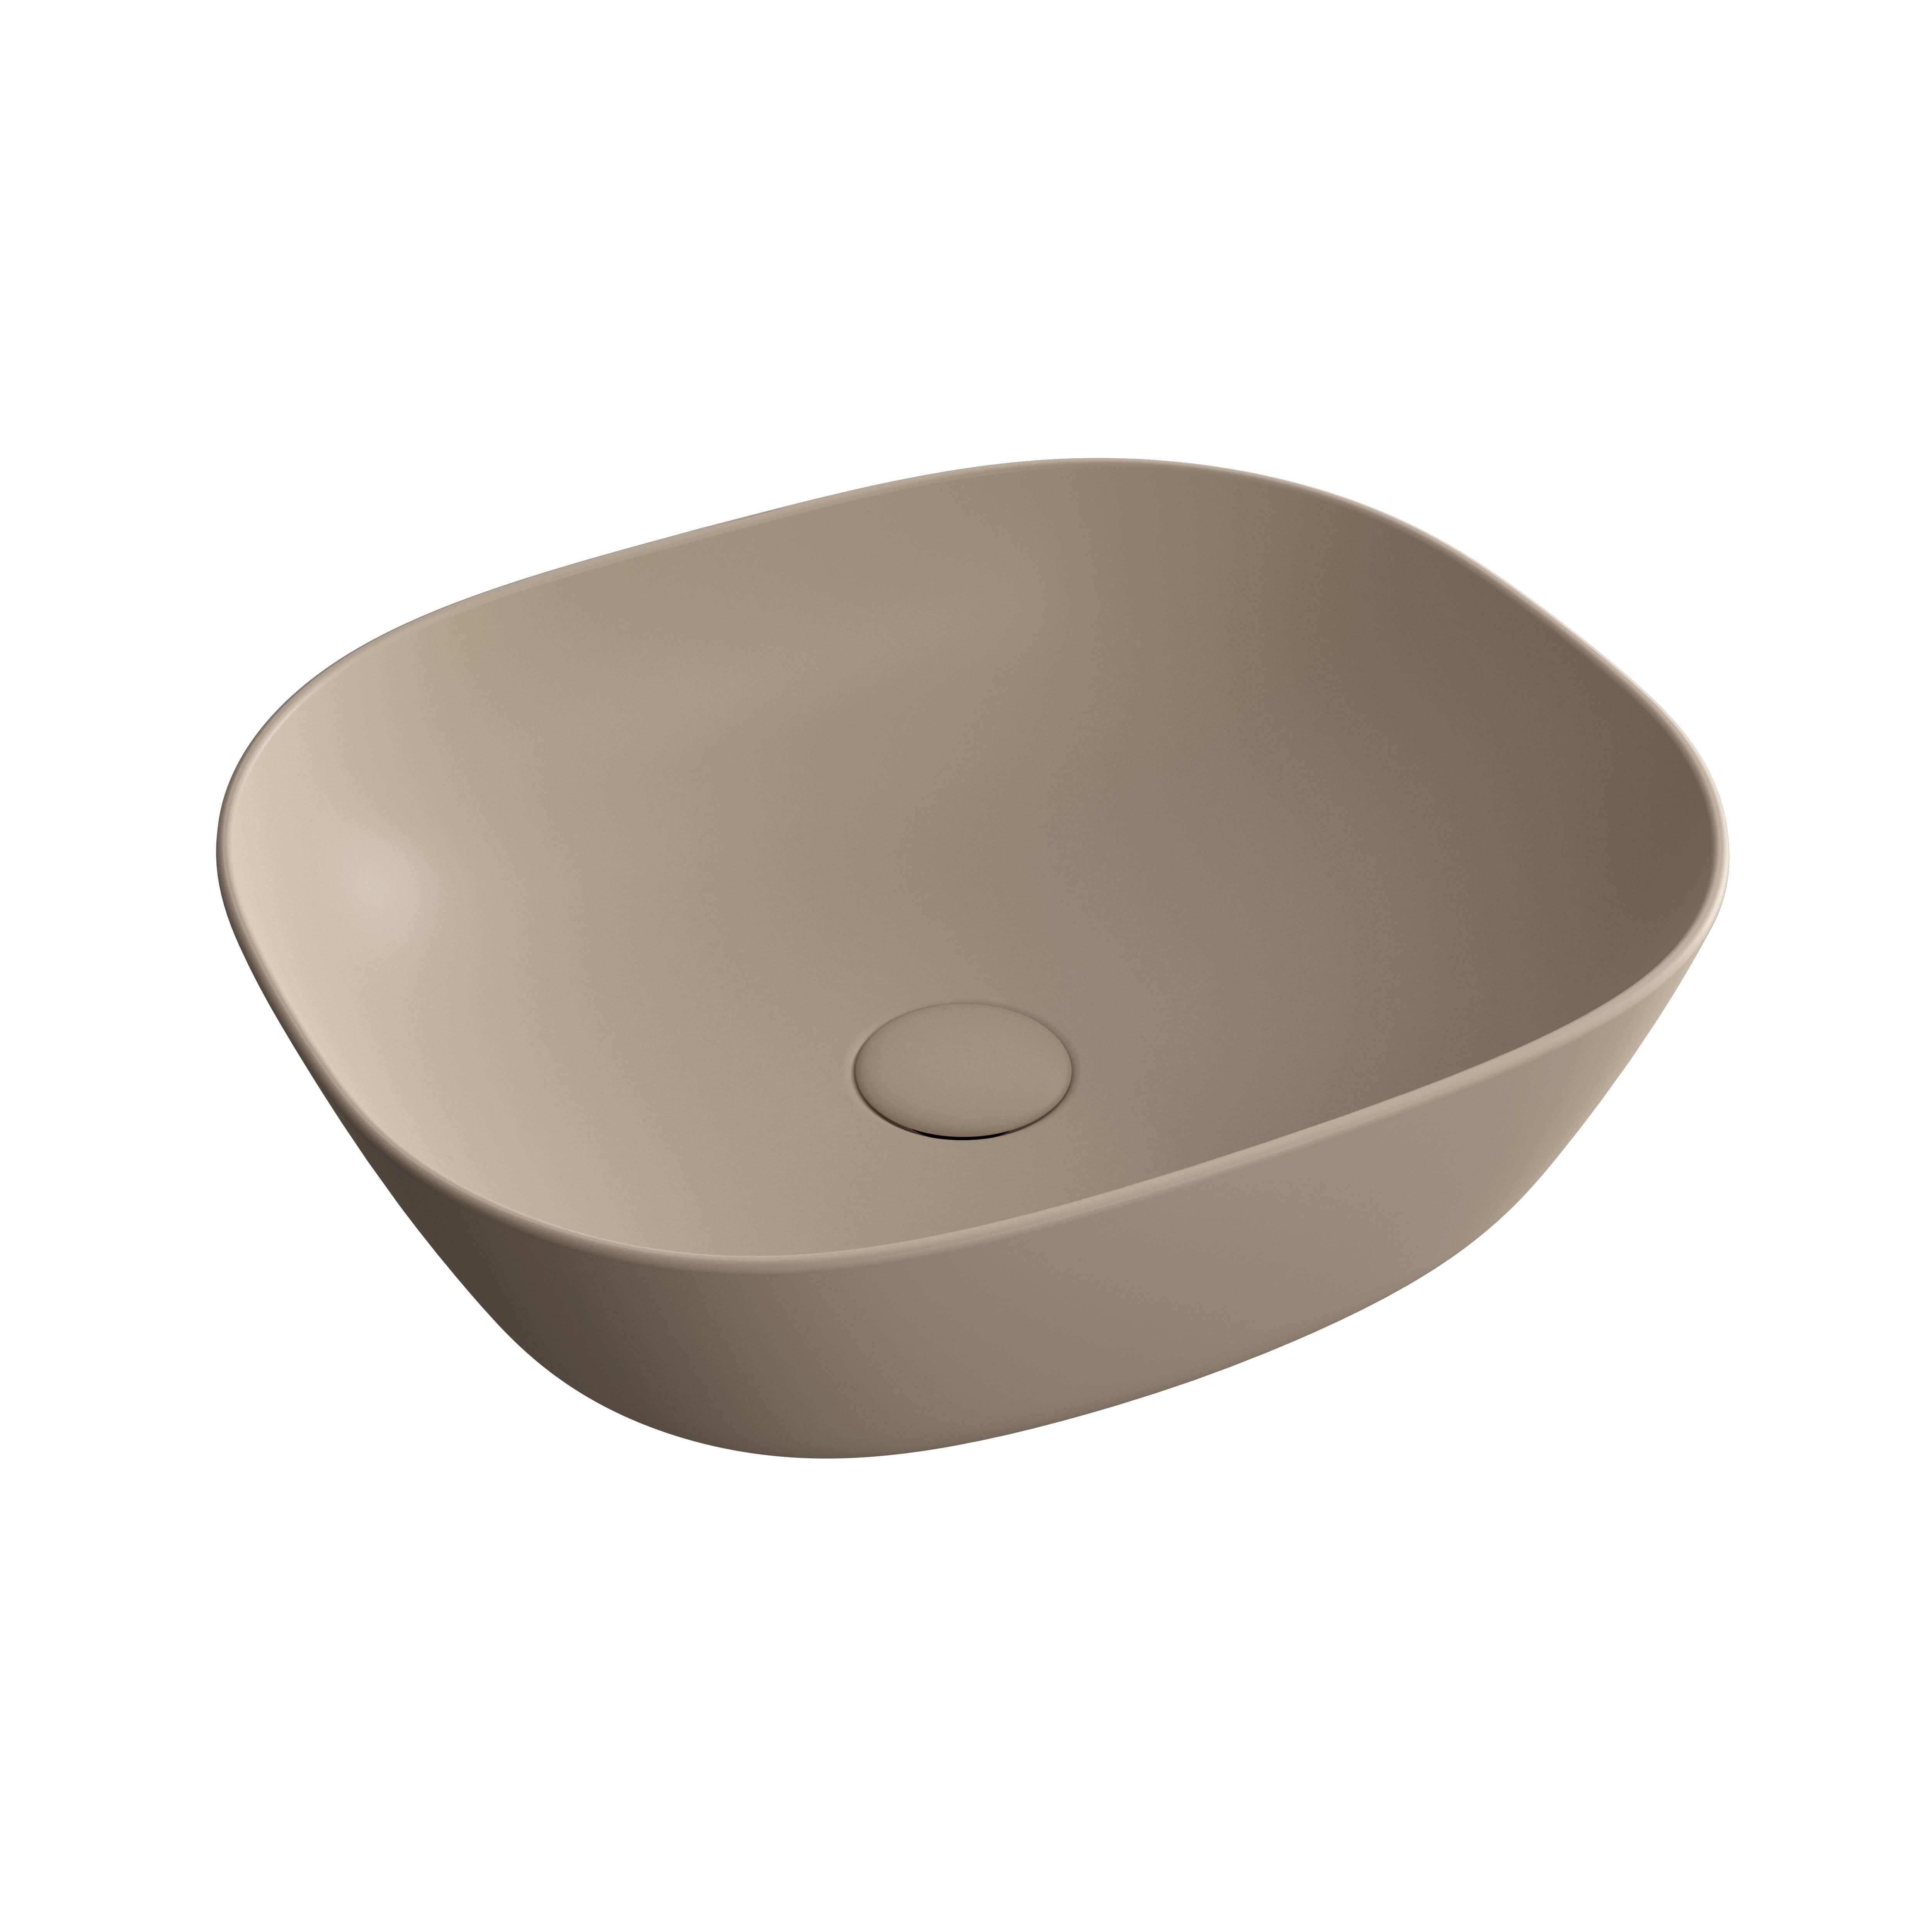 Plural vasque bas, argile mat